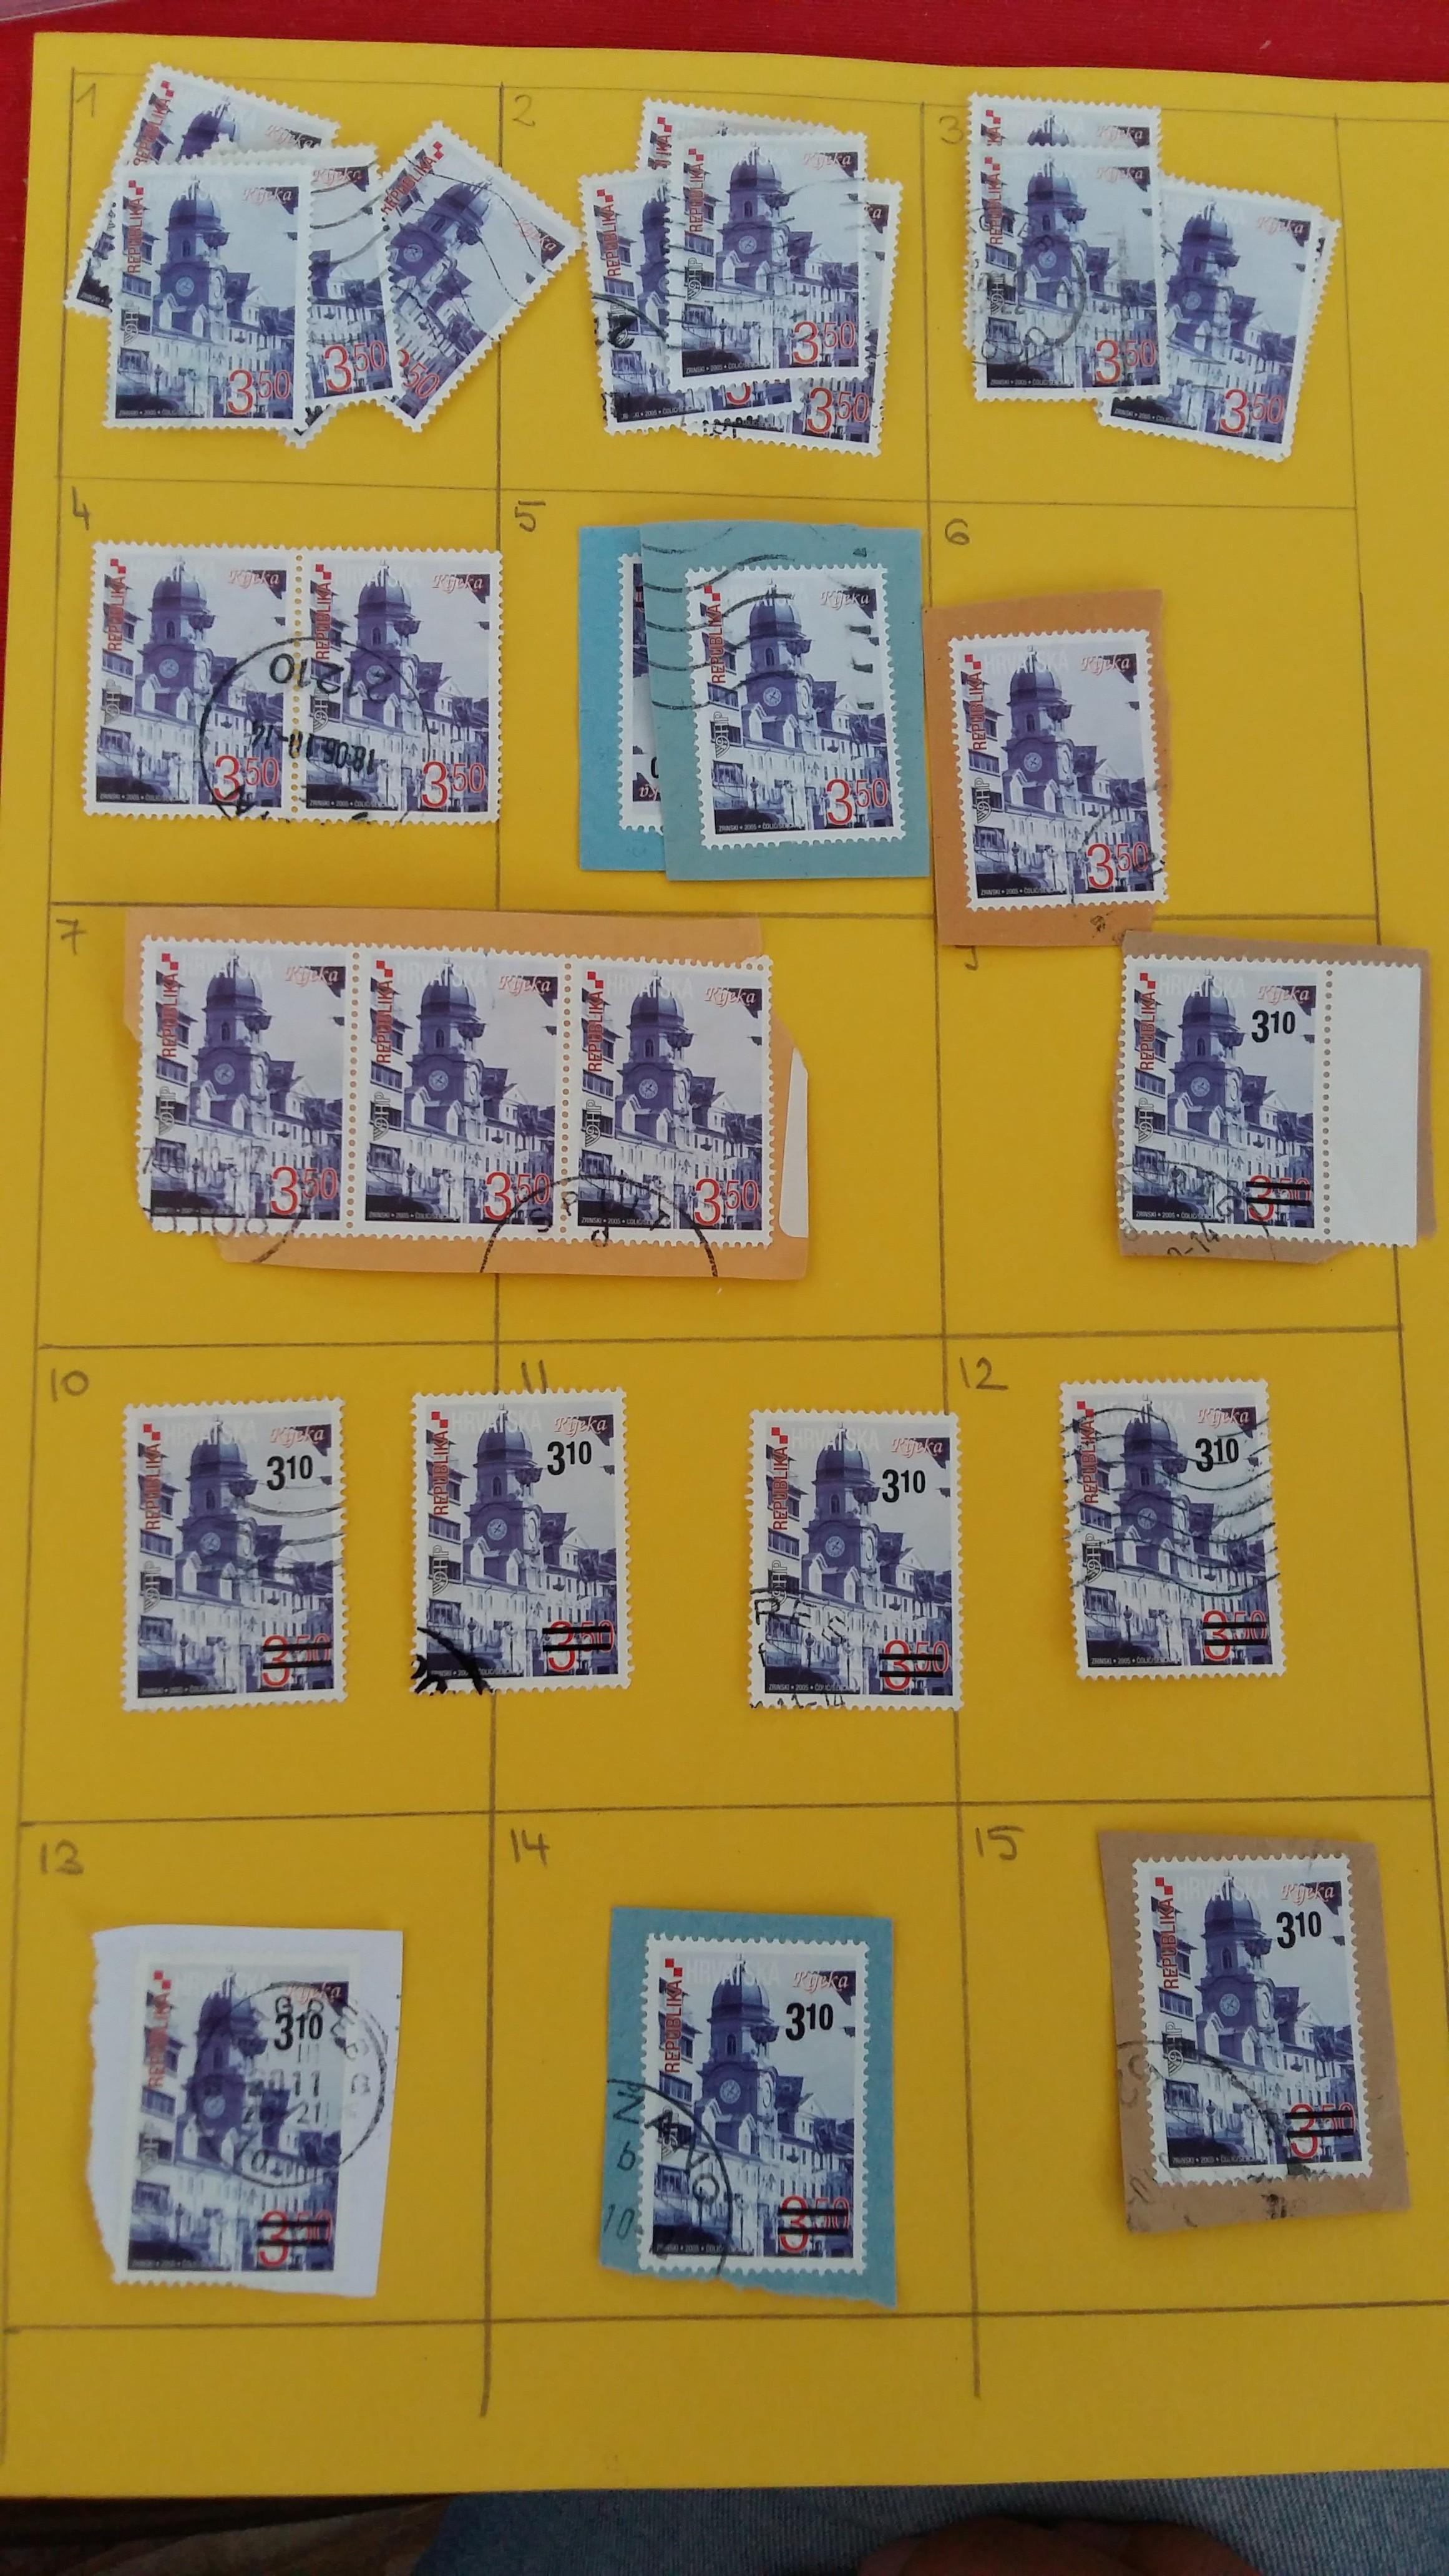 Croatia double stamps 20190928-142736